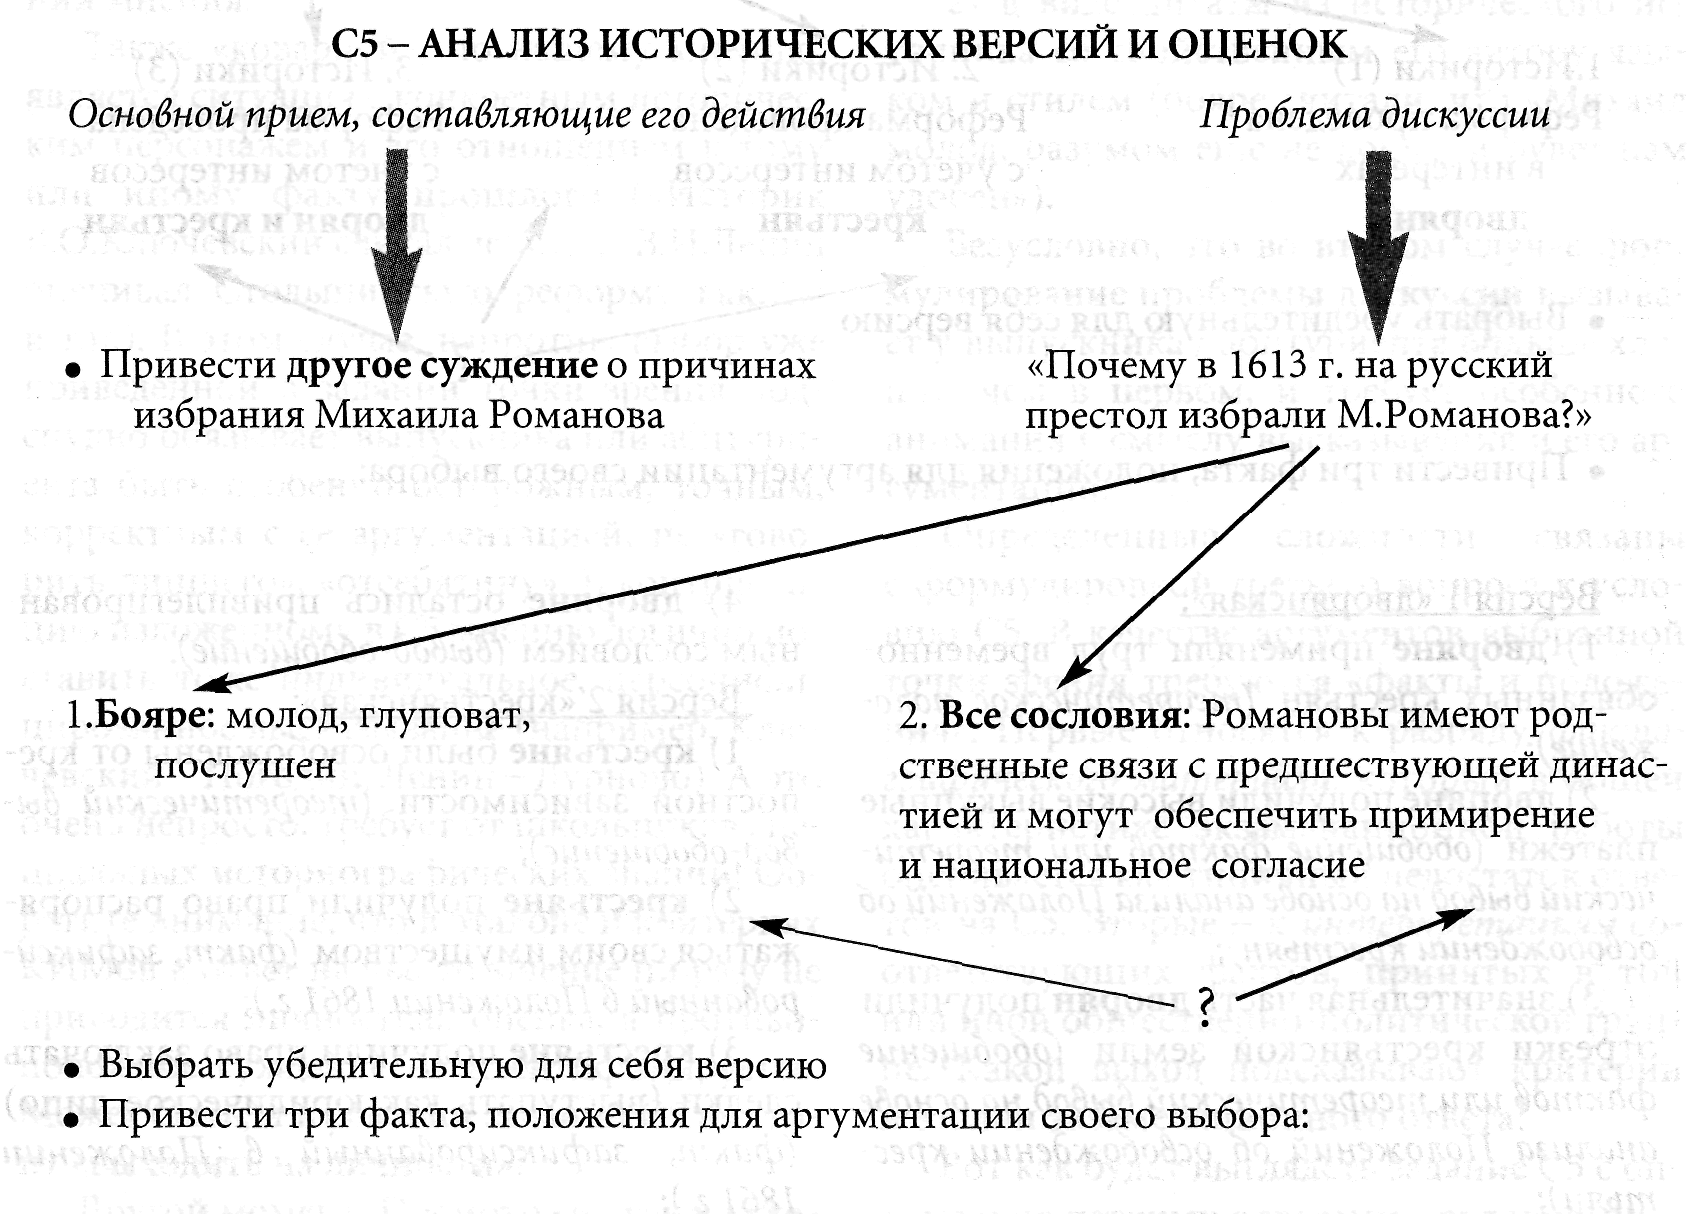 http://www.150solumc.edusite.ru/images/clip_image003.png